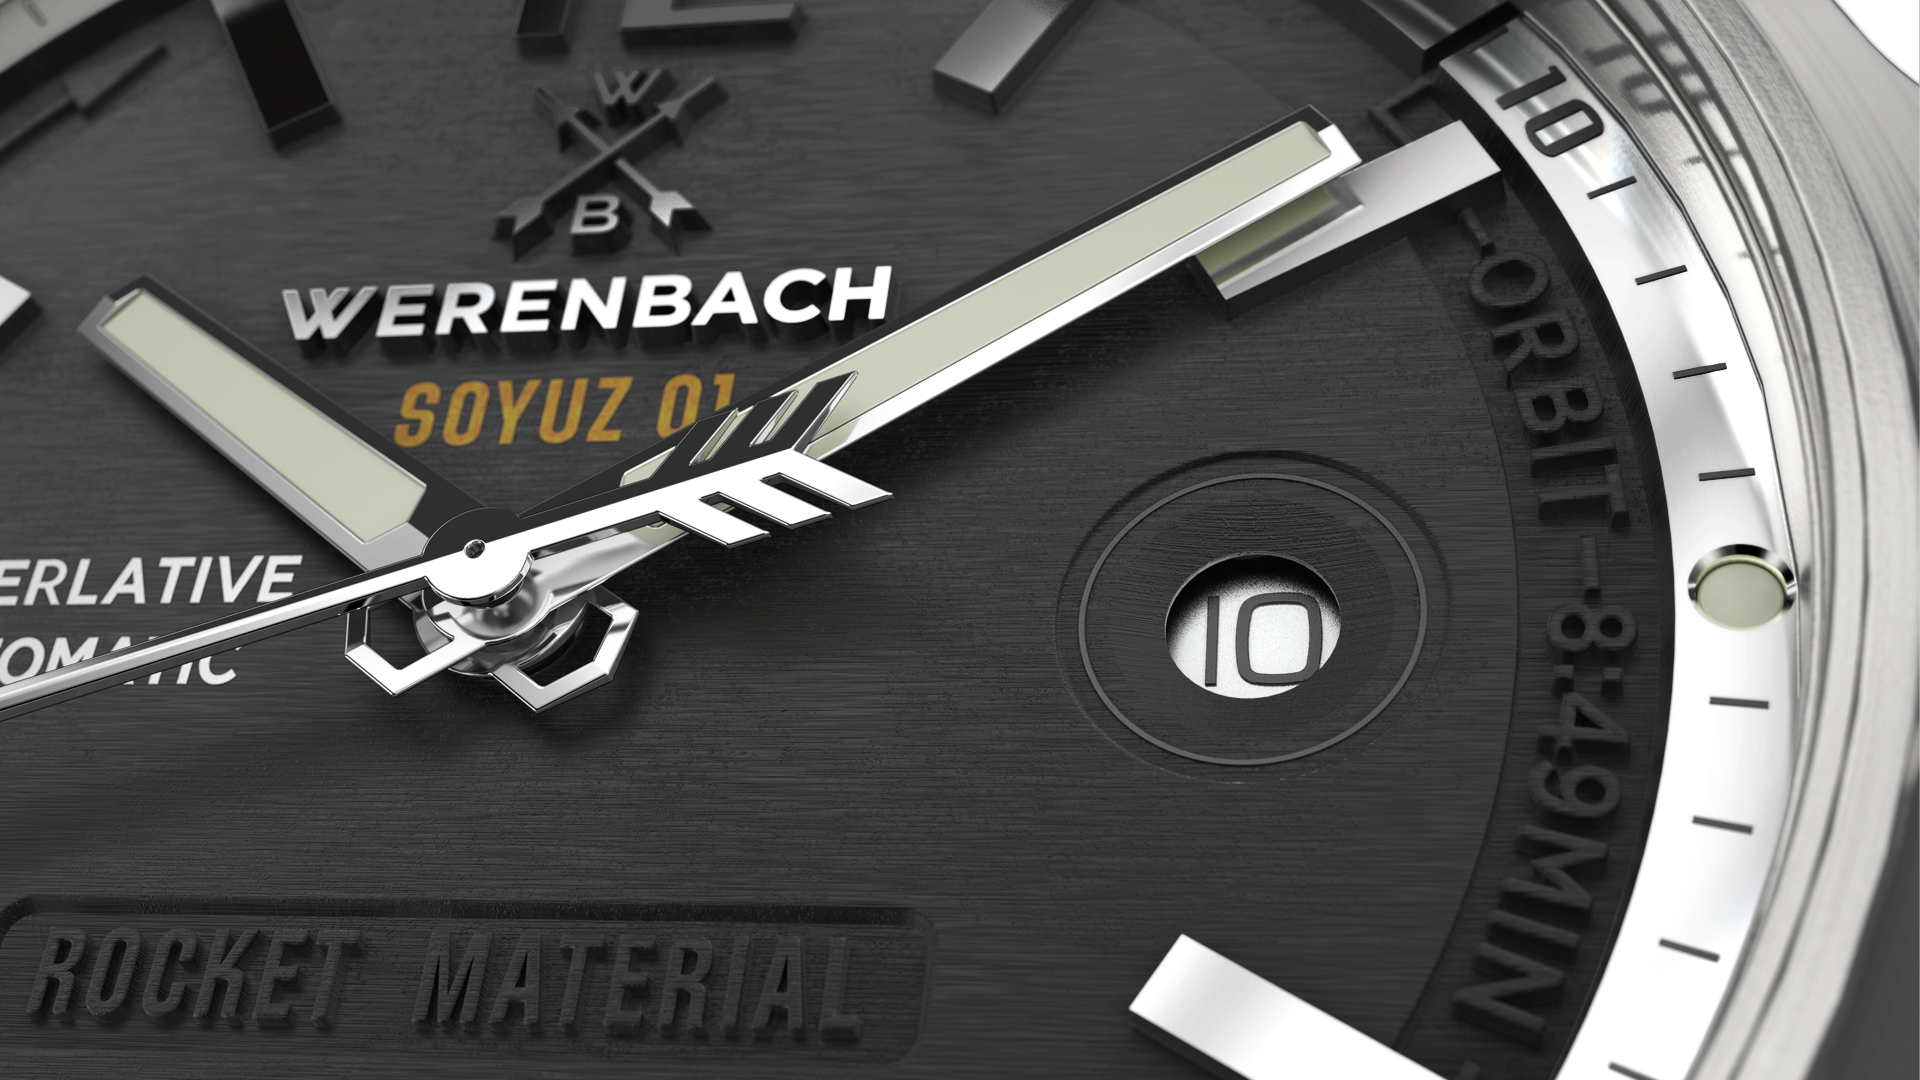 werenbach-soyuz-01-superlative-black-bg-dial